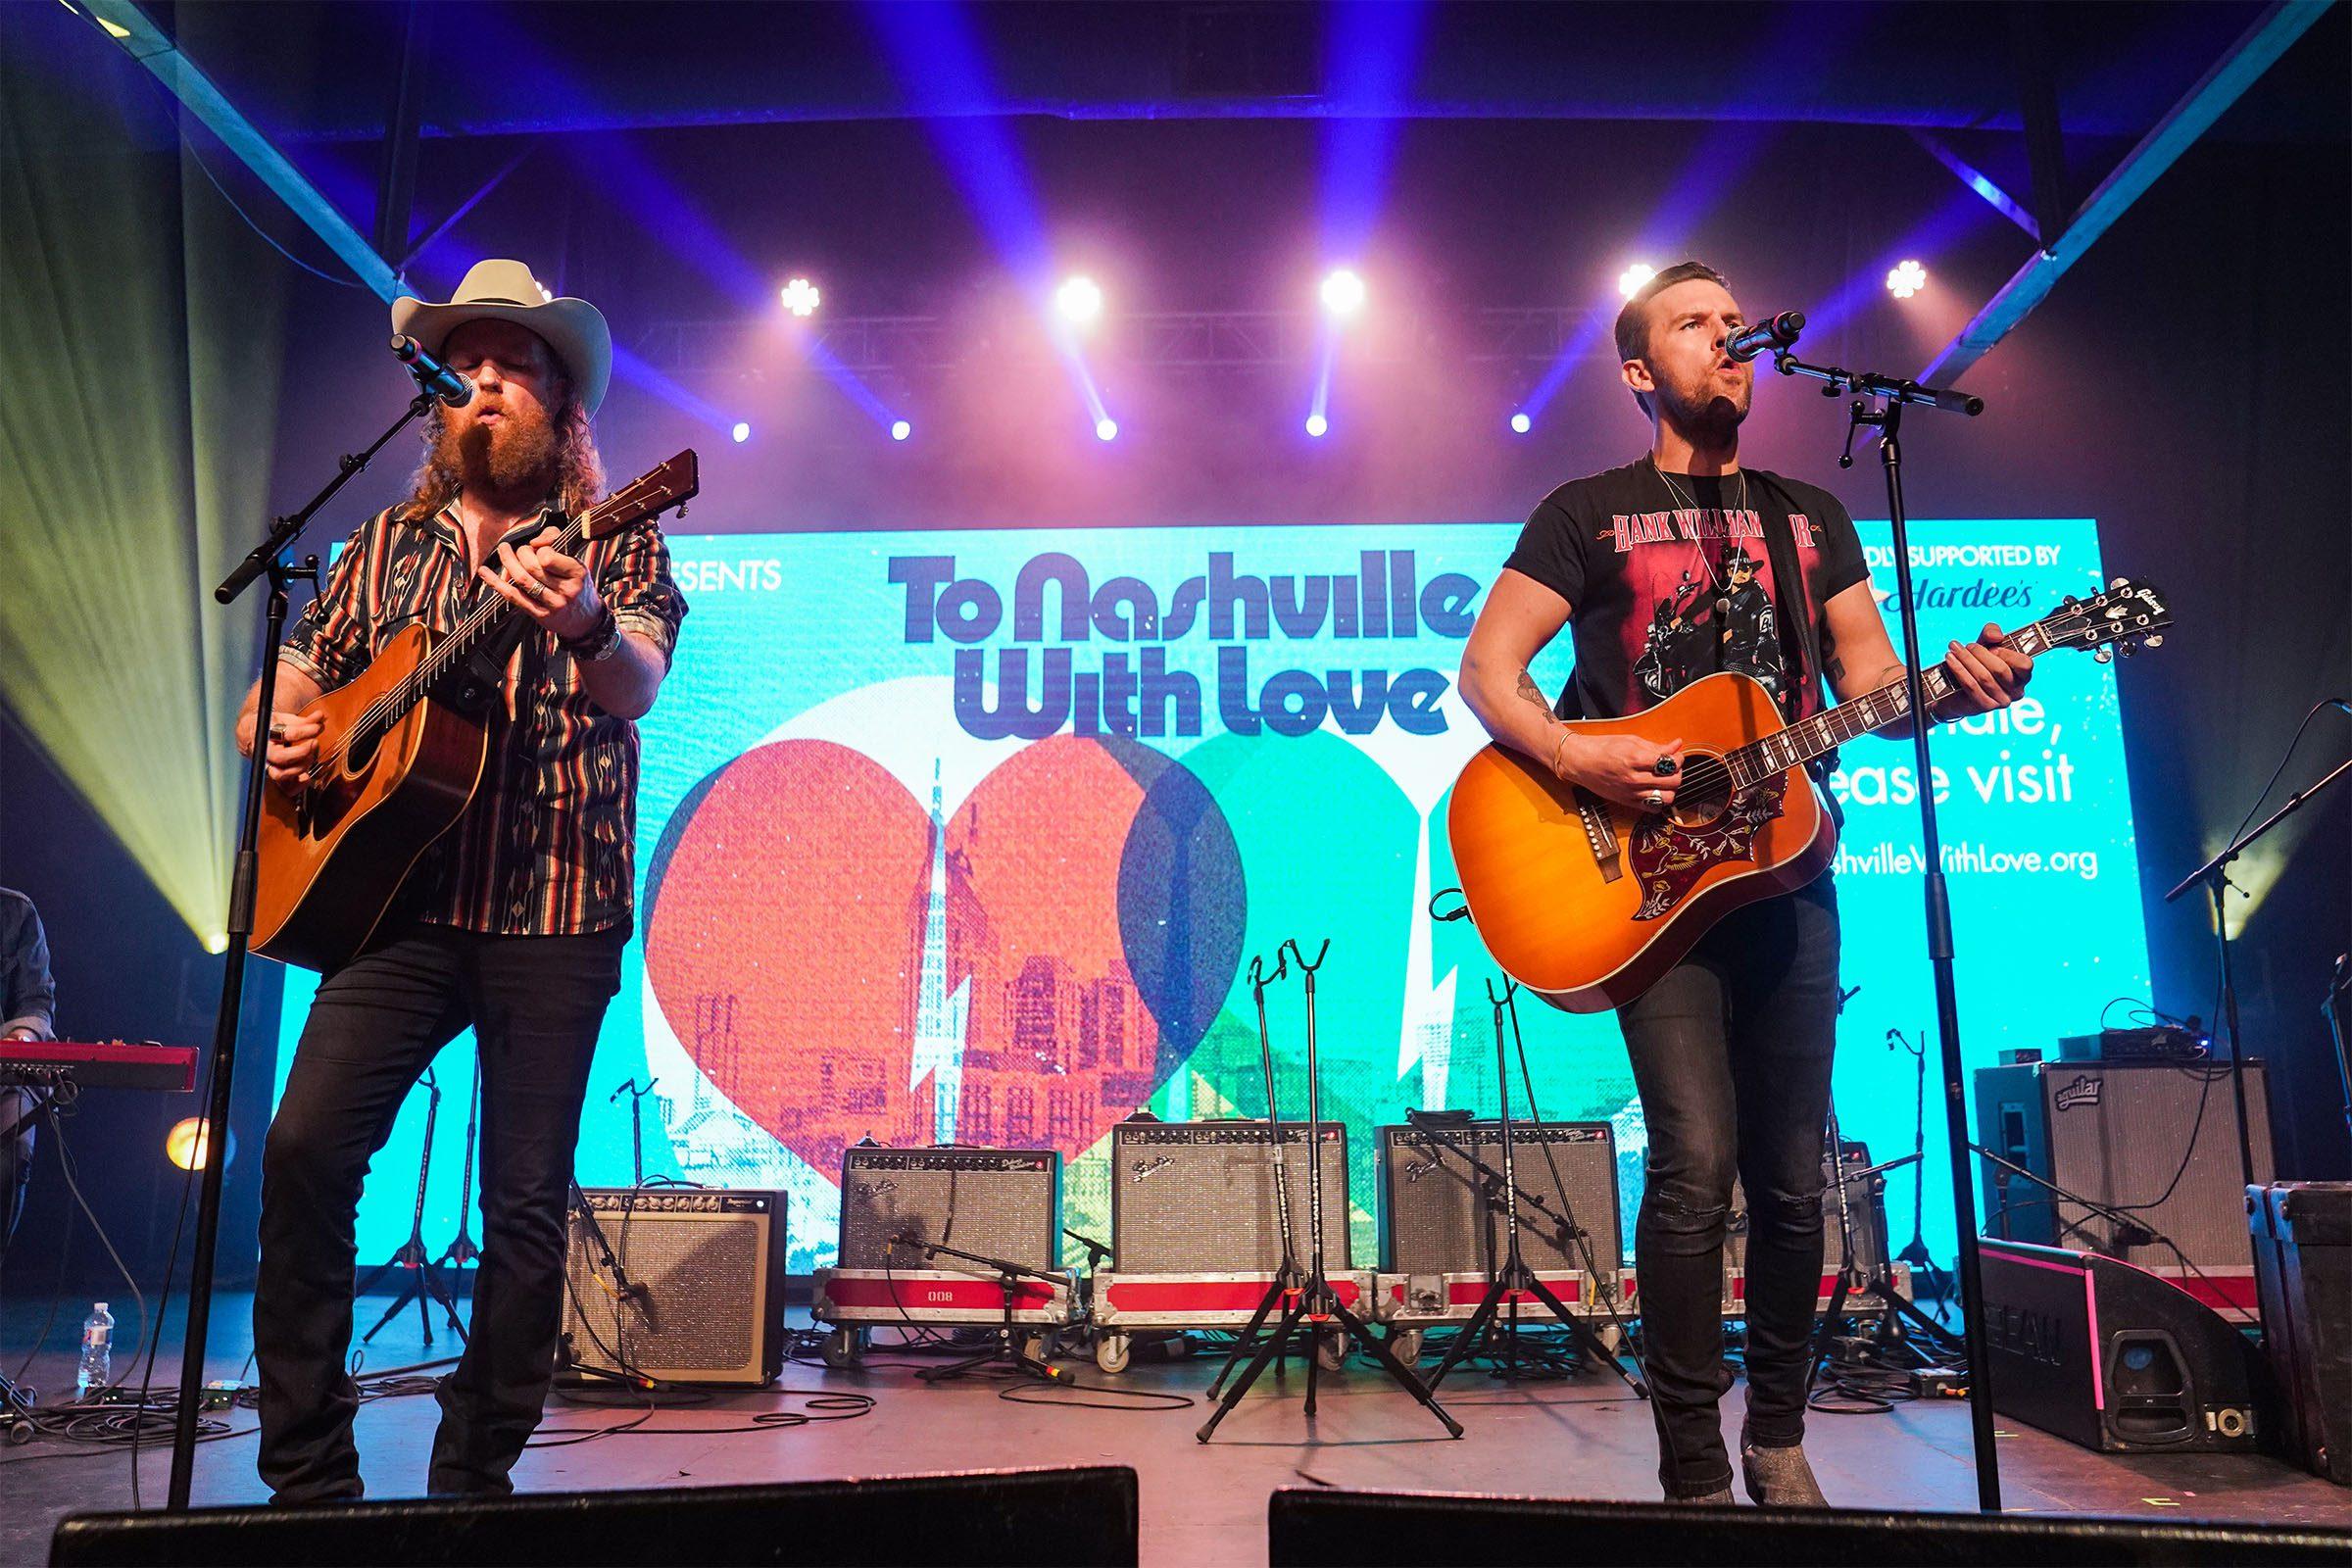 Nashville stars to hold benefit concert for tornado relief